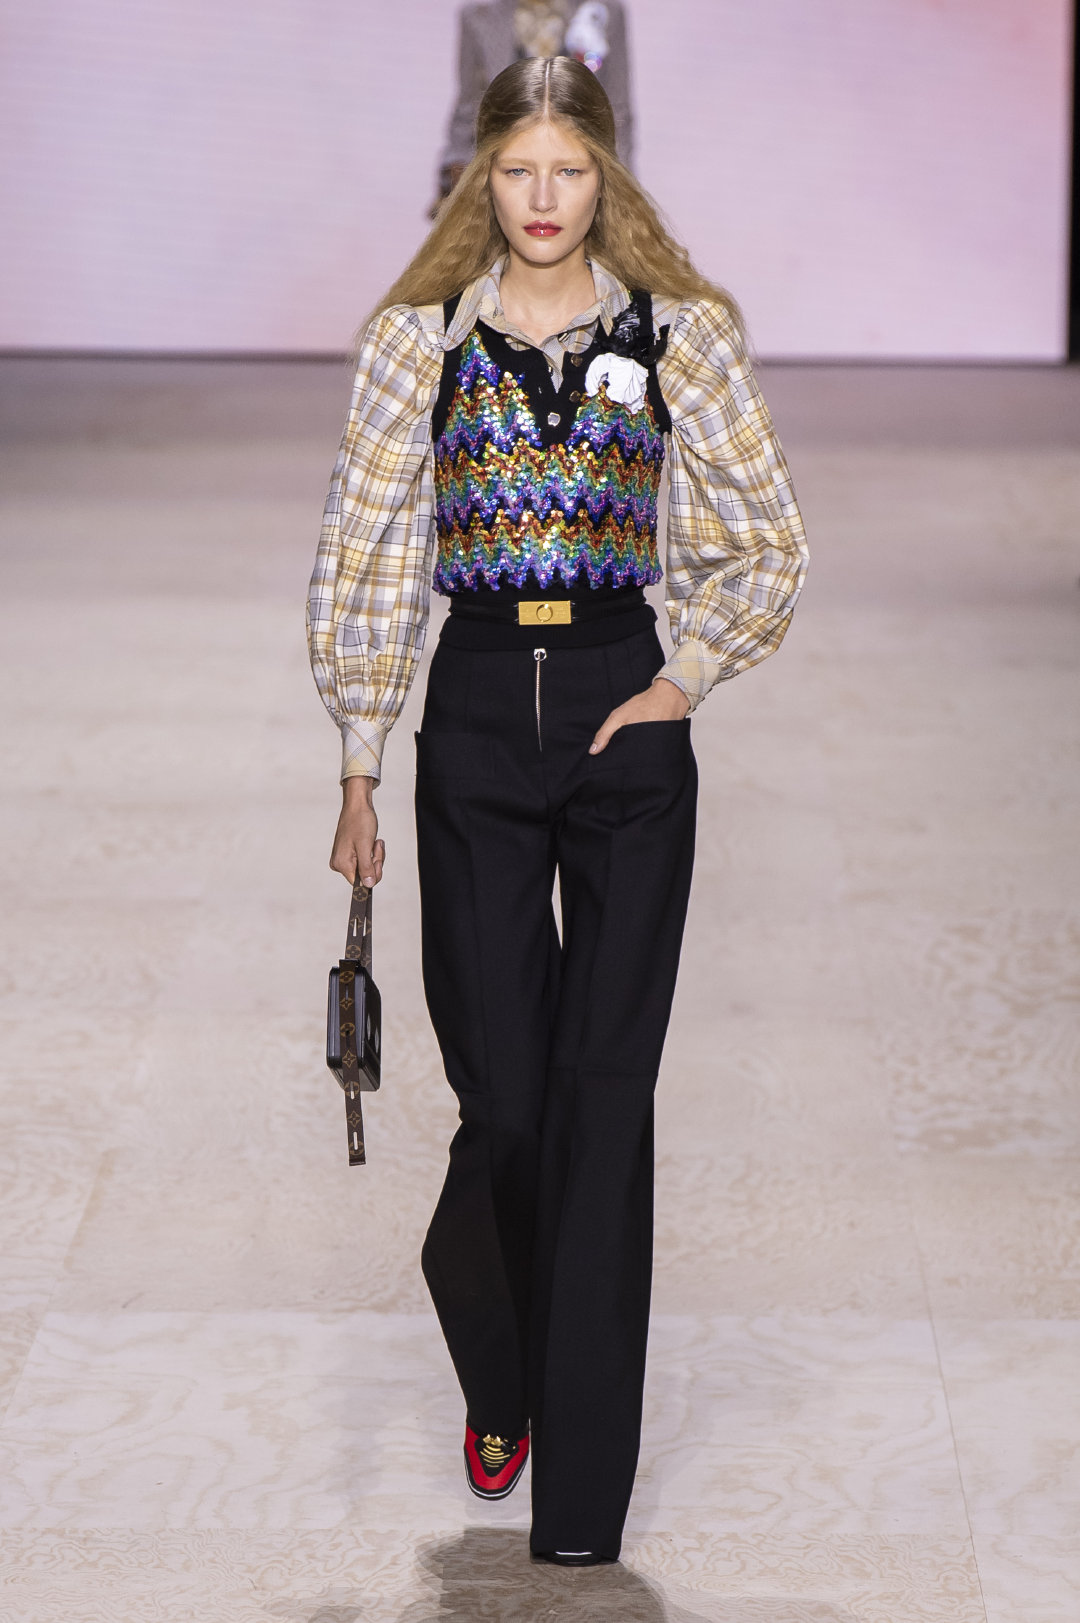 Louis Vuitton再现昔日巴黎的优雅奢华,色彩印花轮廓展现美好时代